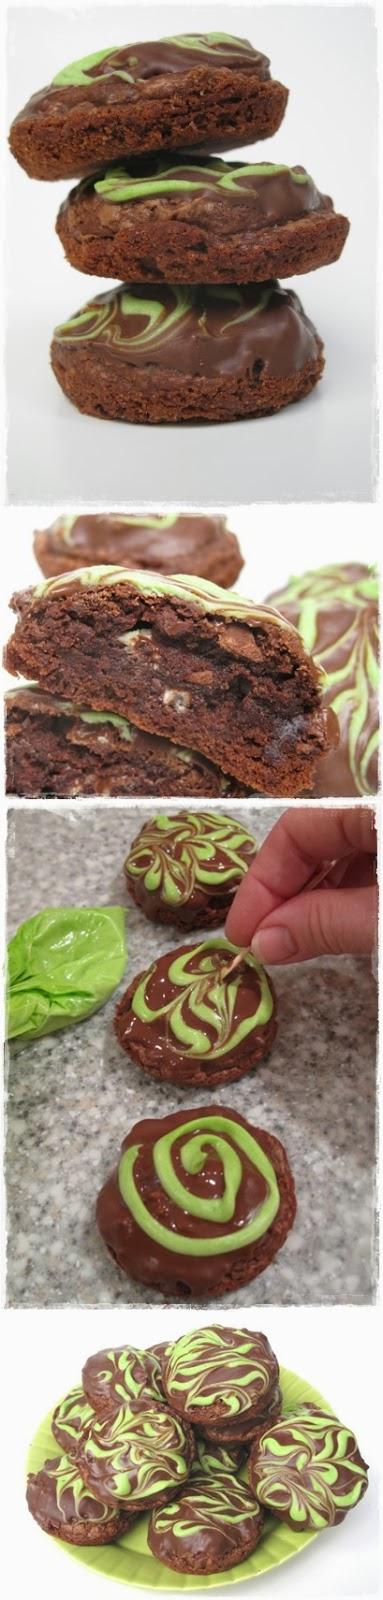 CHOCOLATE MINT TRUFFLE BROWNIE BITES, CHOCOLATE, TRUFFLE